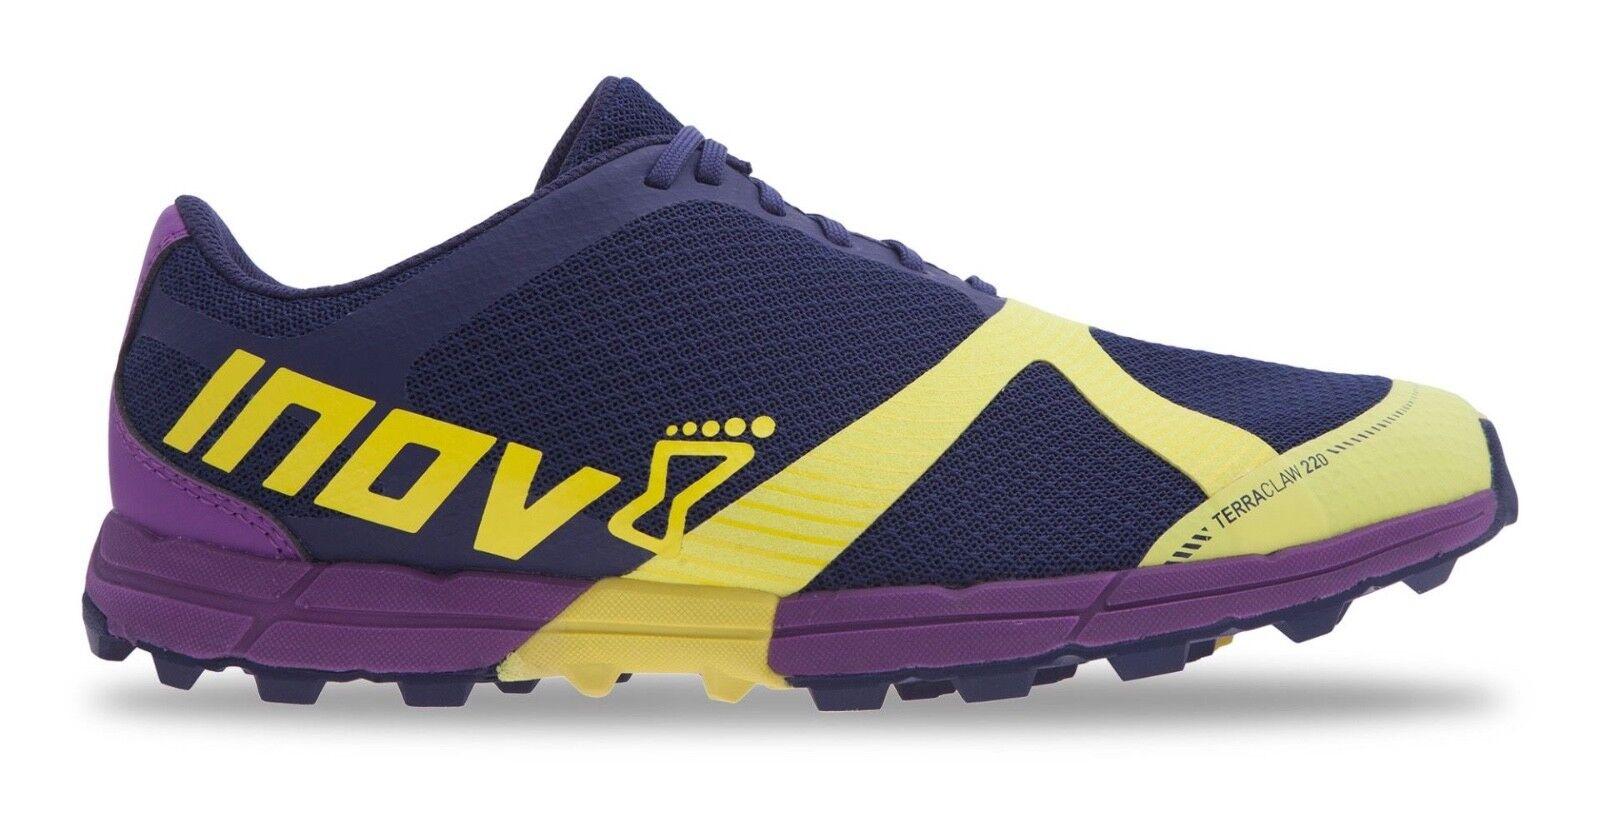 Inov - 8 Mujer terraclaw 220 Trail Running Running Running zapatos Berry Azul Negro  orden ahora disfrutar de gran descuento